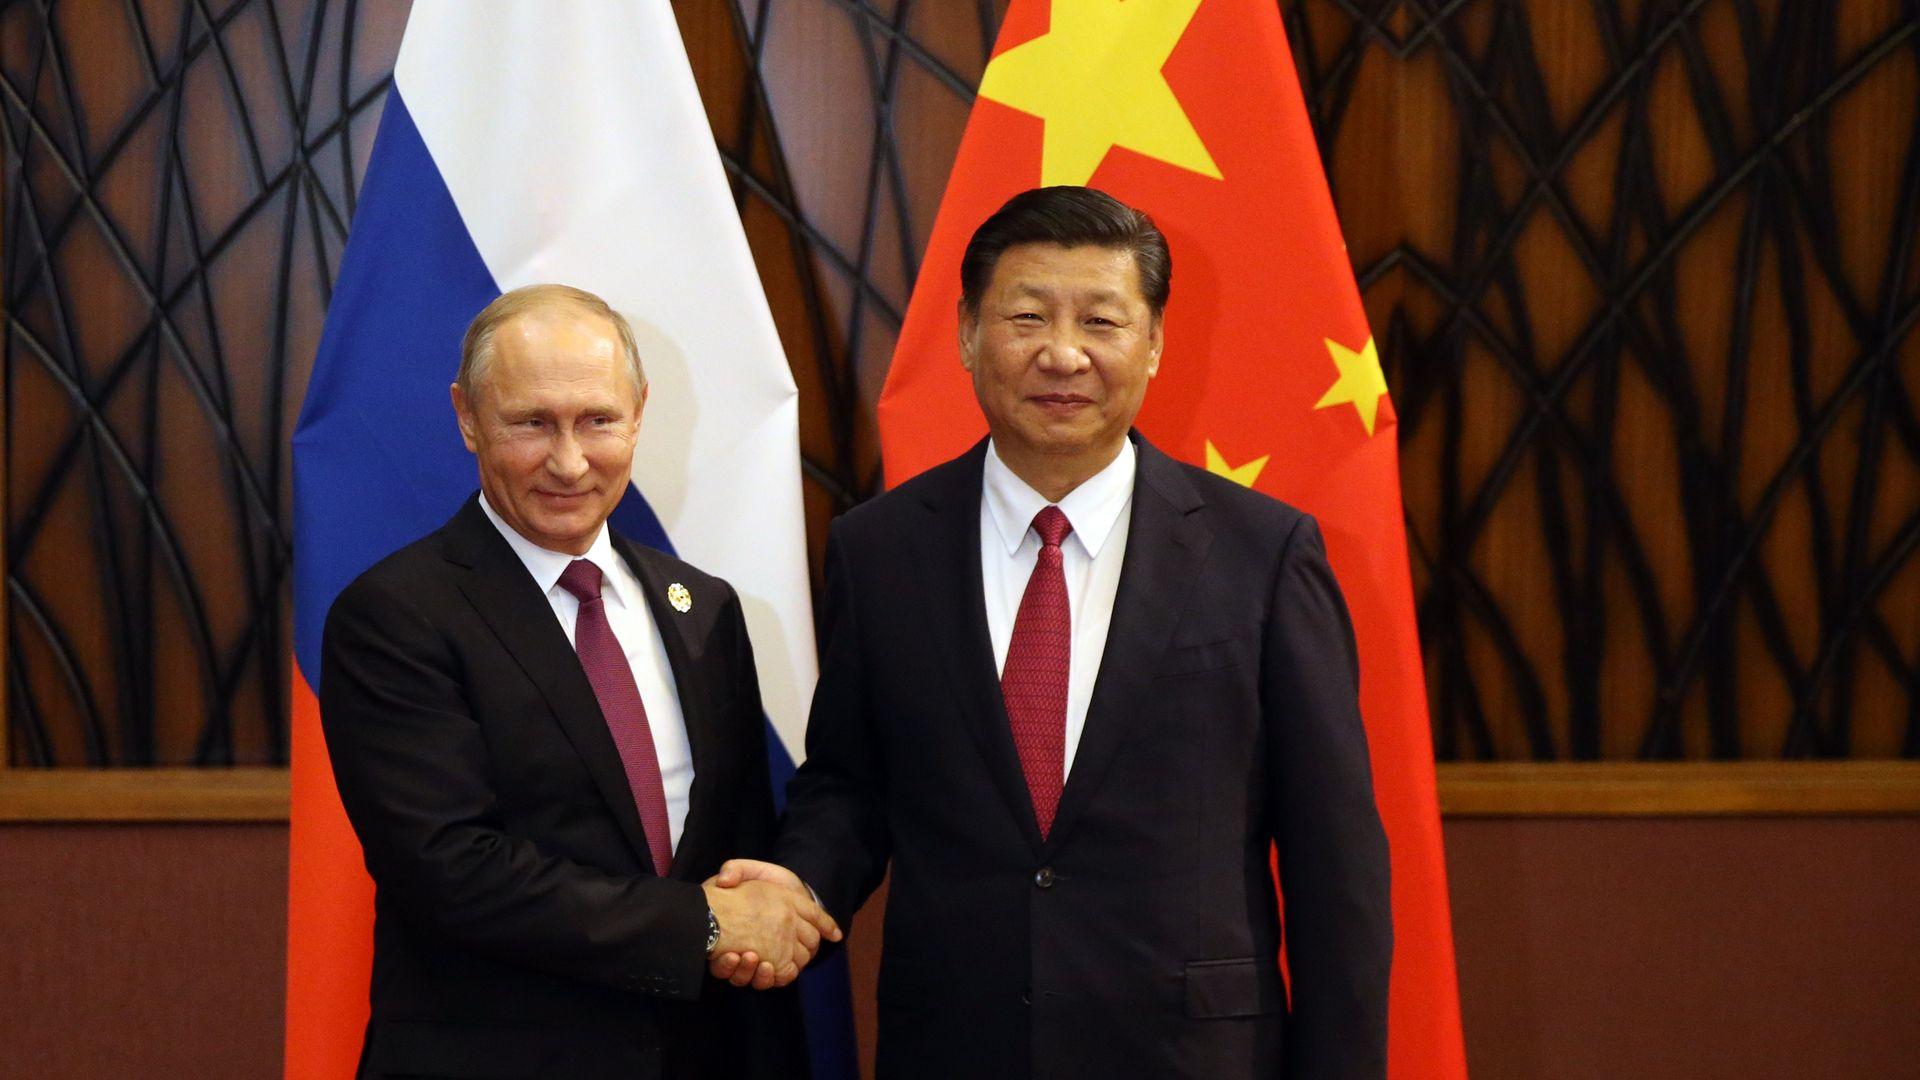 Xi and Putin.